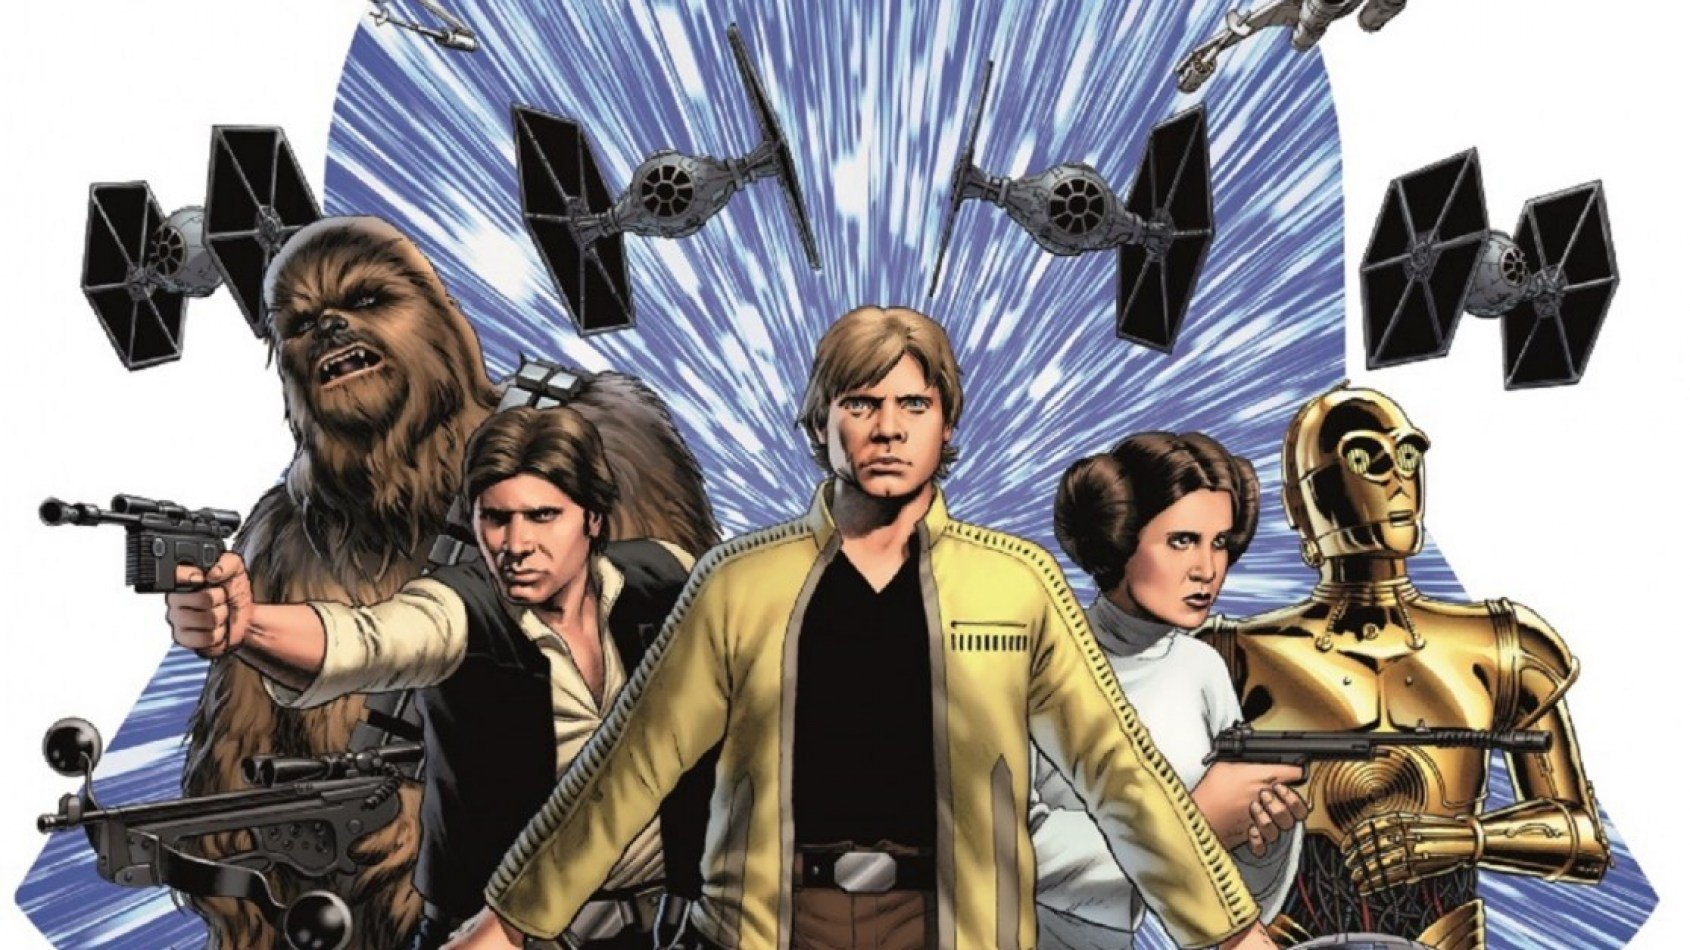 [Review] Star Wars 1 : Skywalker Passe à l'Attaque et Dark Vador 1 : Vador